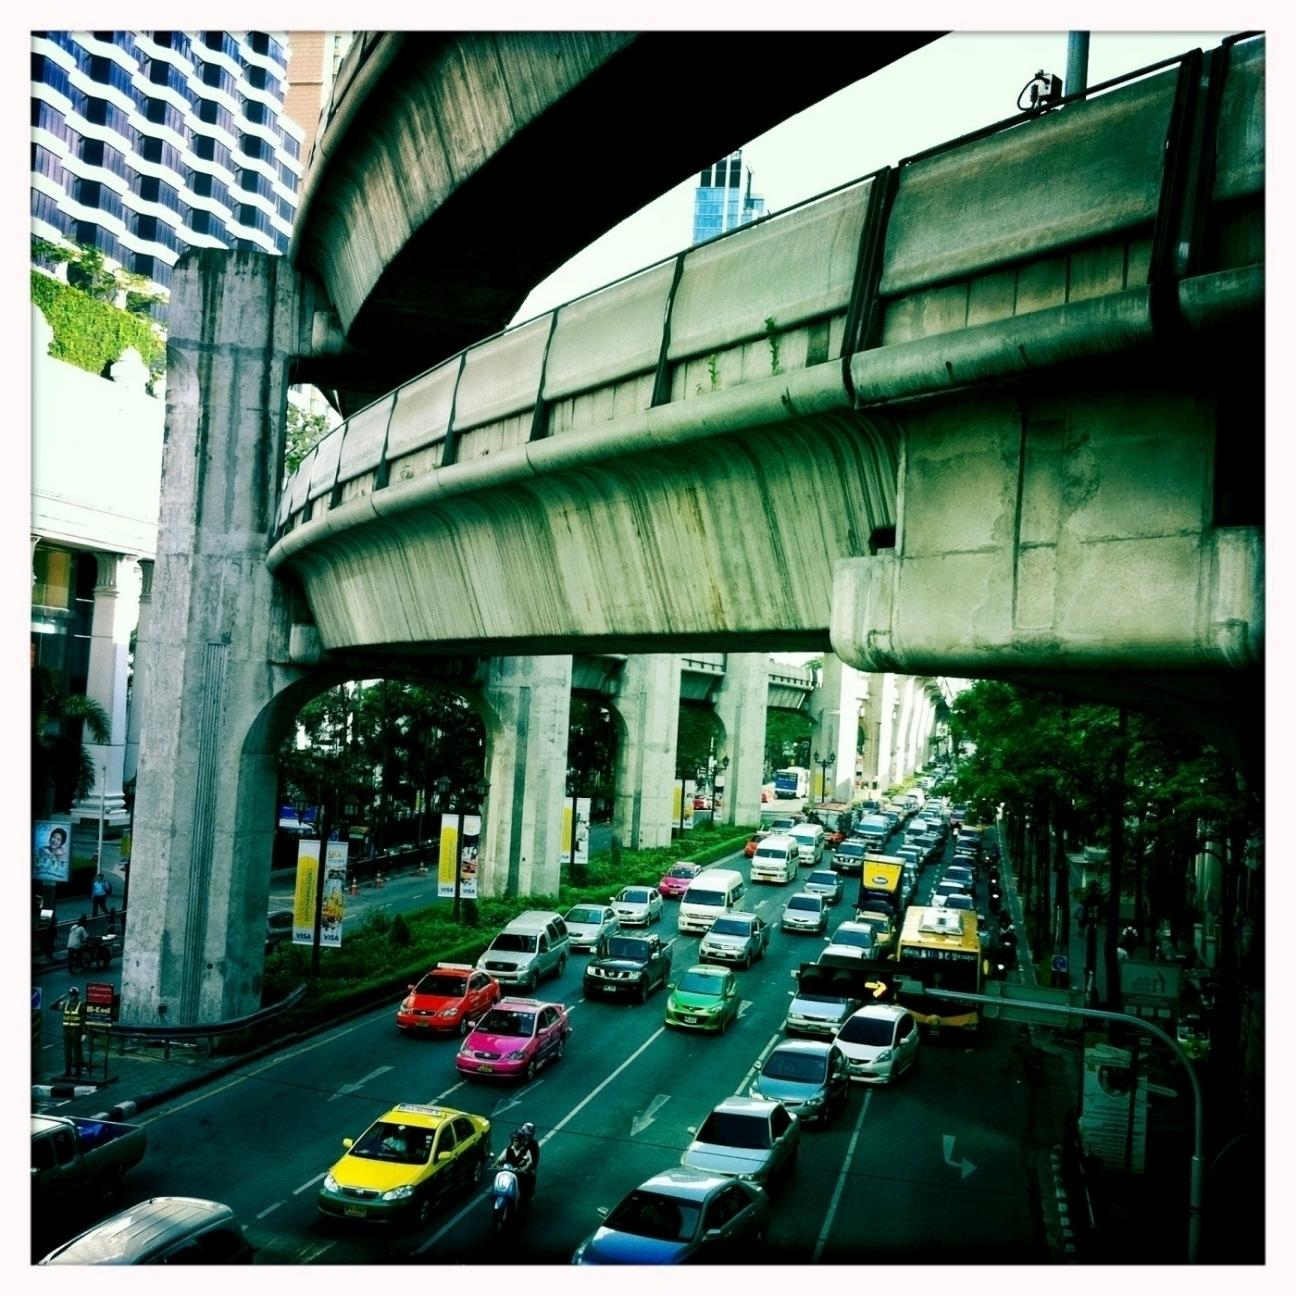 Skytrain Bangkok - Photography, Architecture - marcomariosimonetti | ello